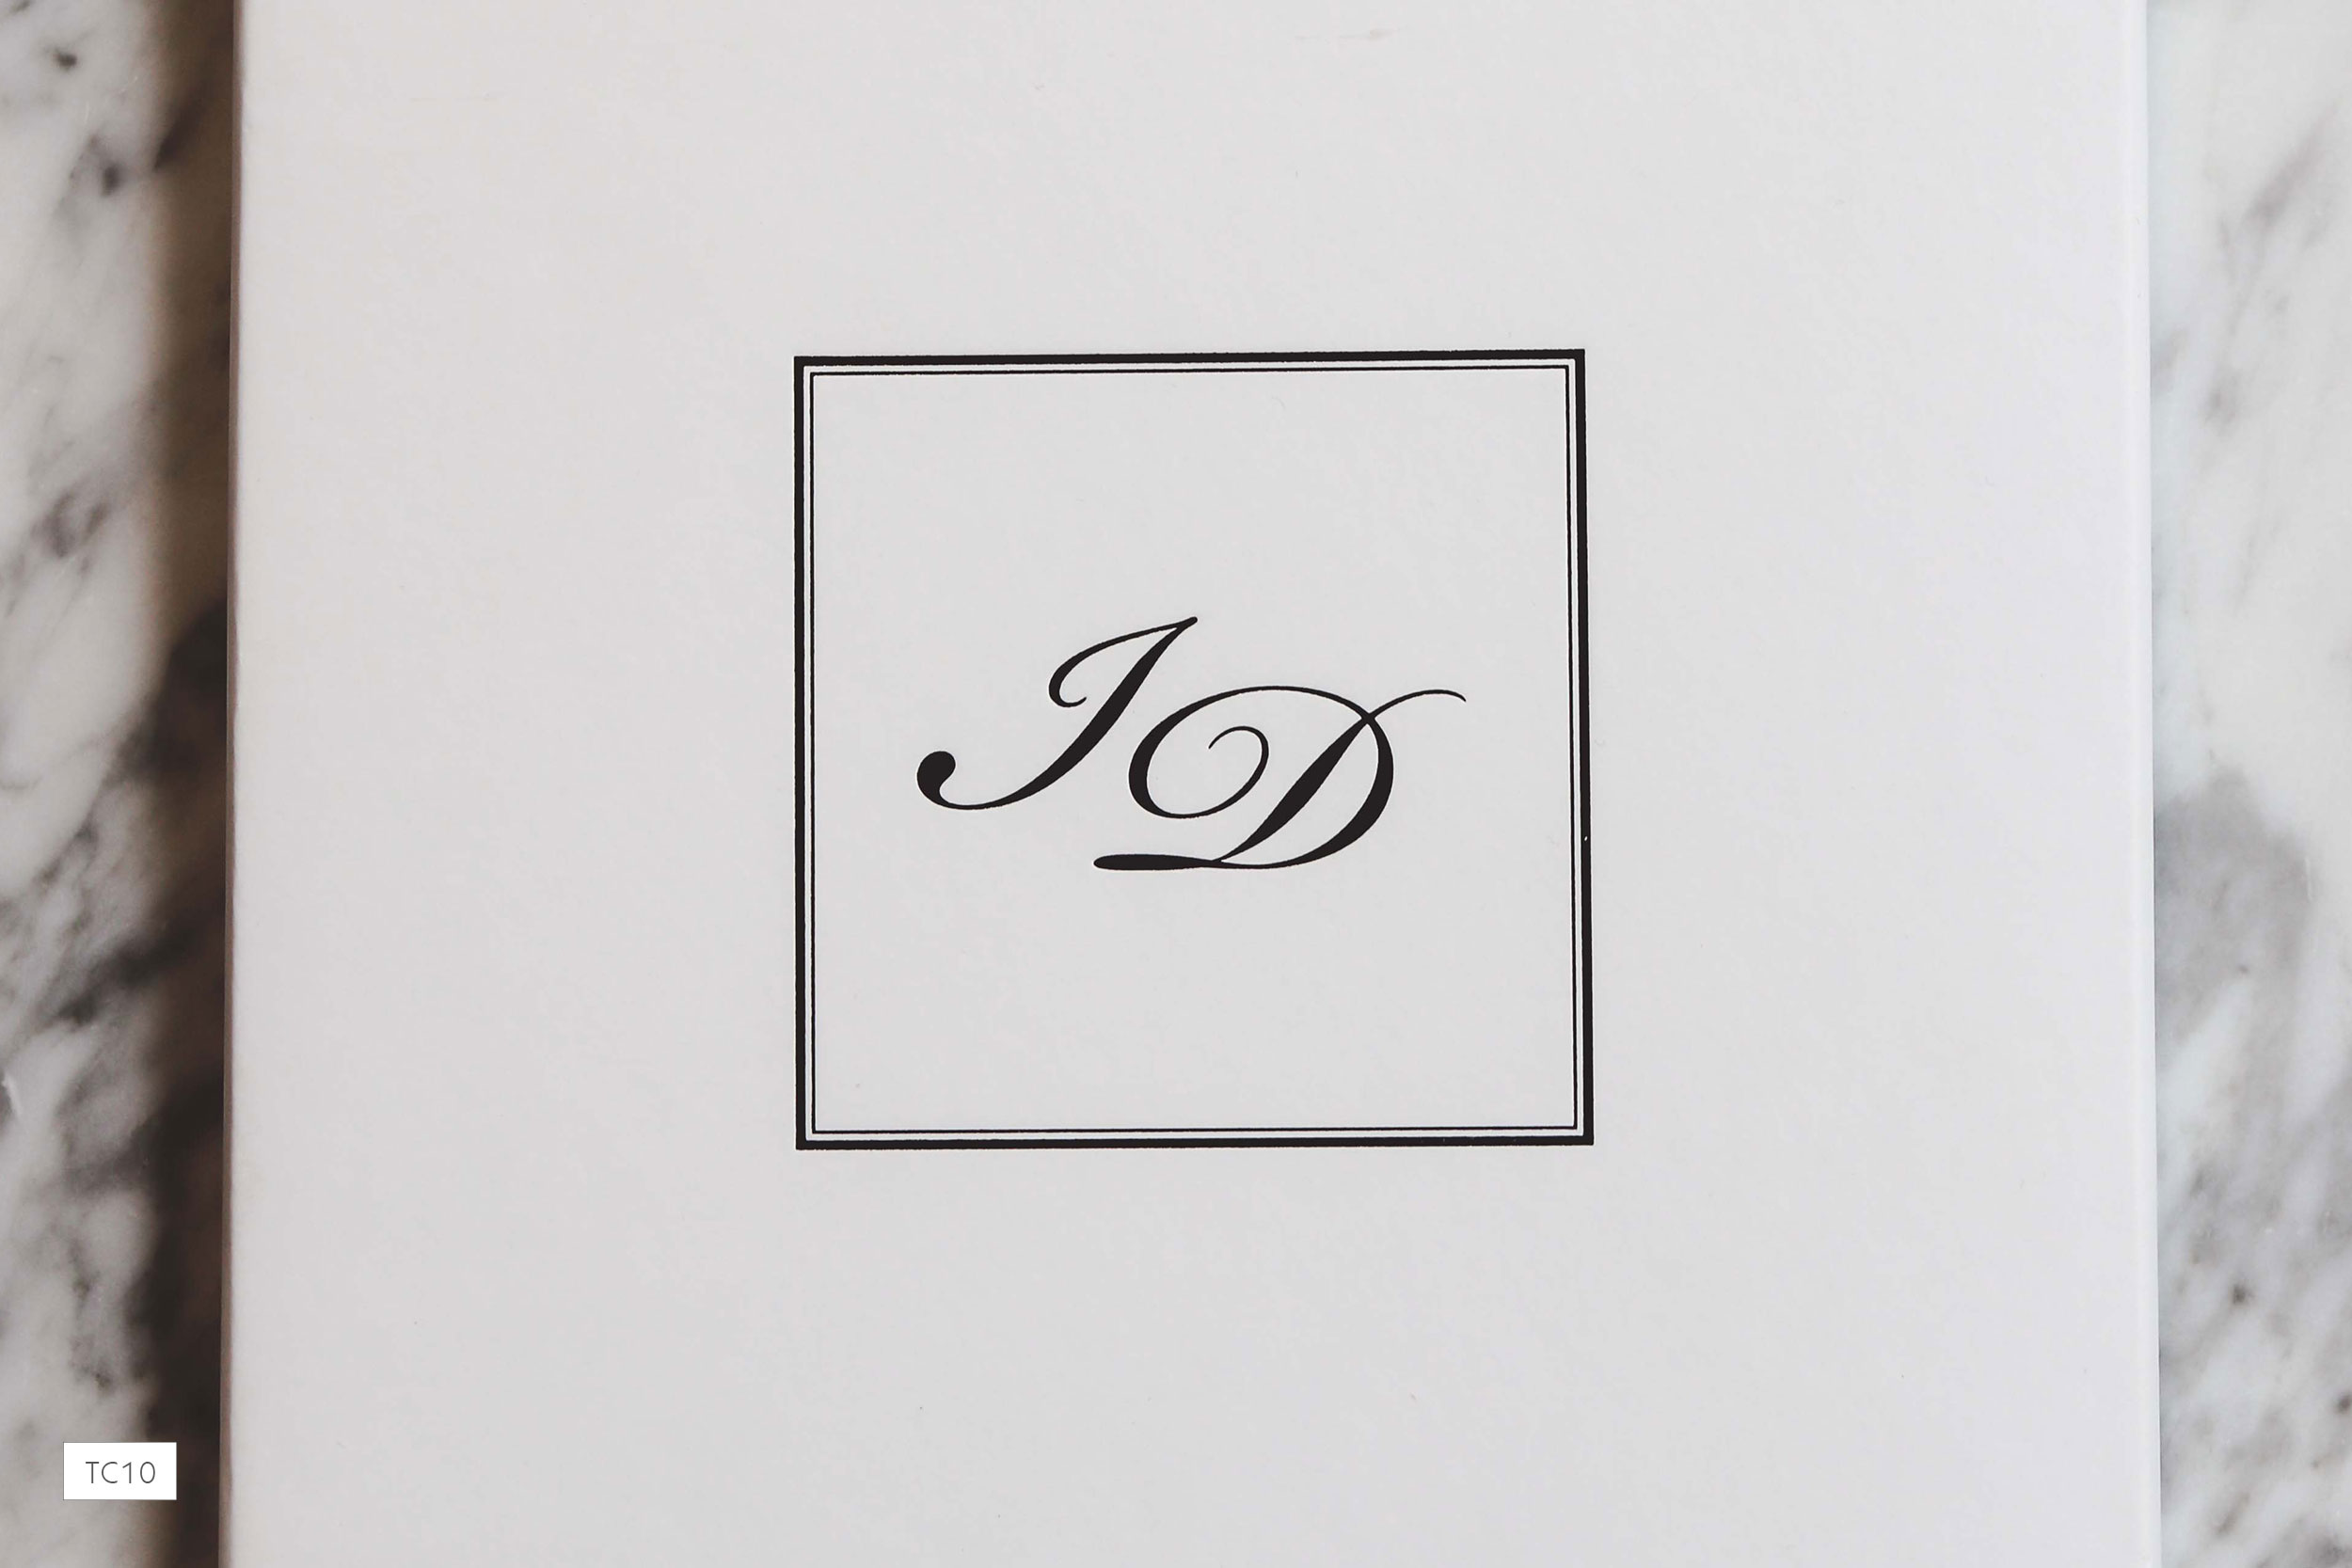 tc10-monochrome-wedding-invitation-packaging.jpg